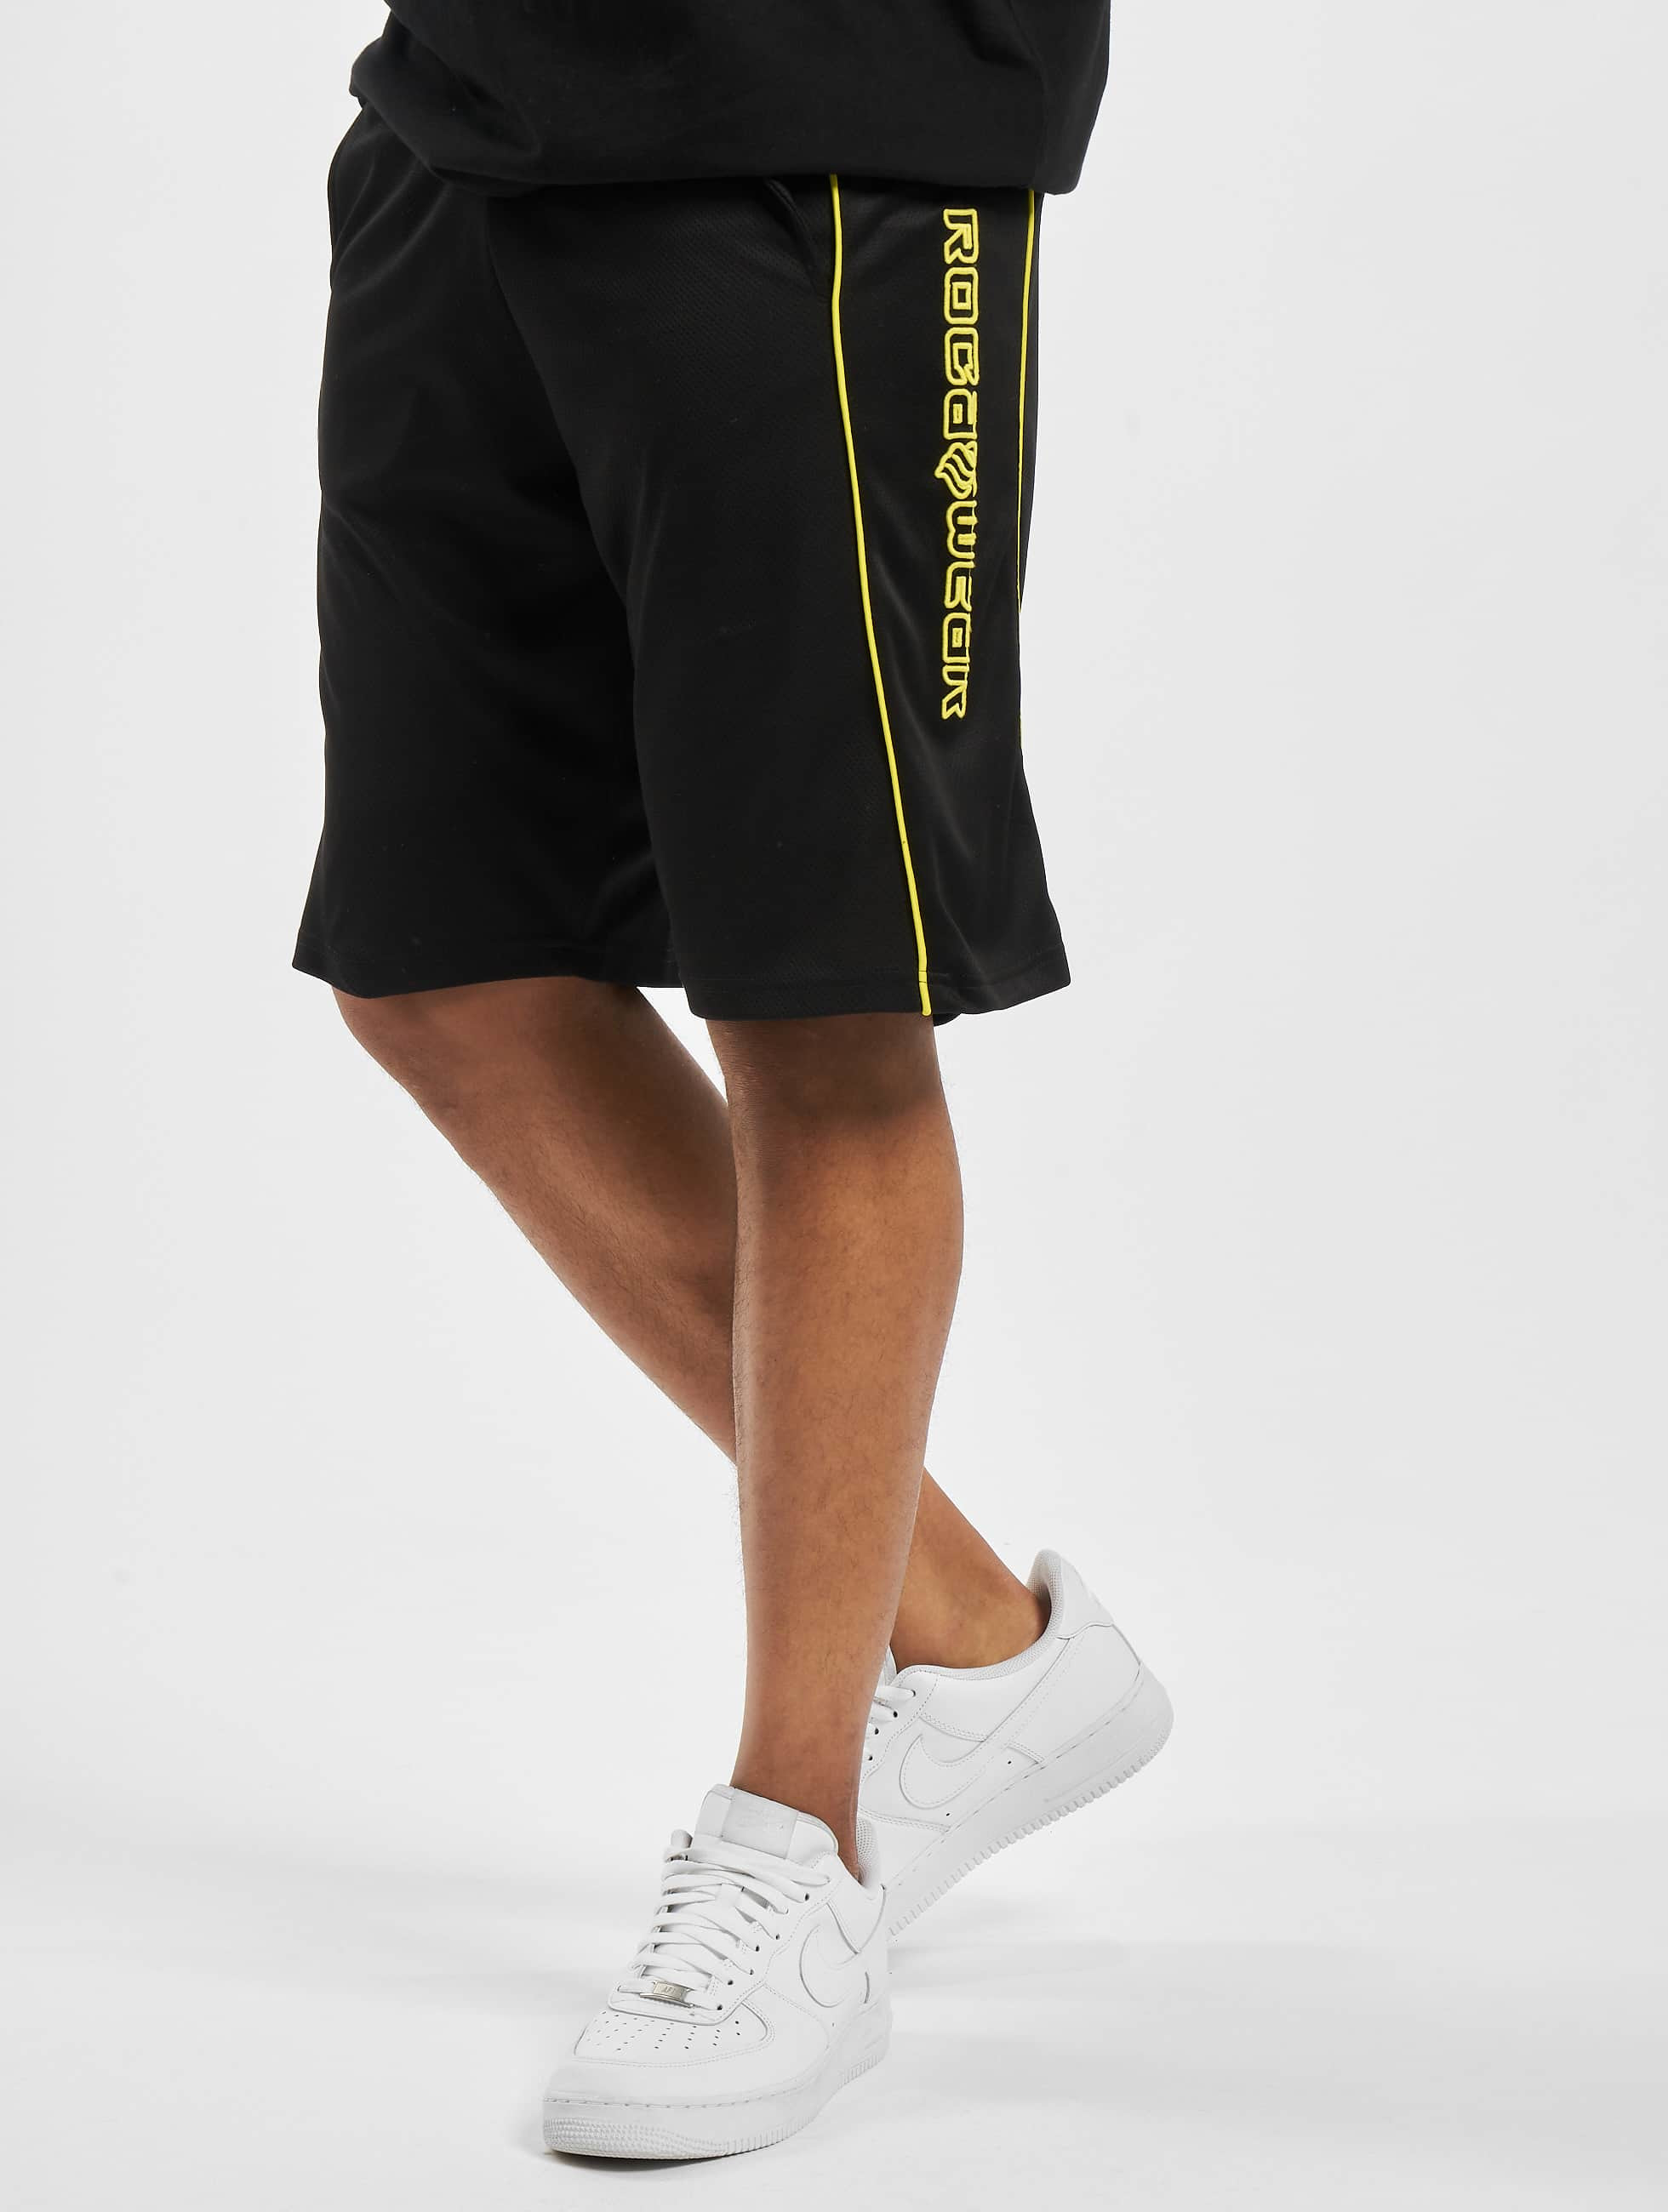 Rocawear / Short Albany in black XL